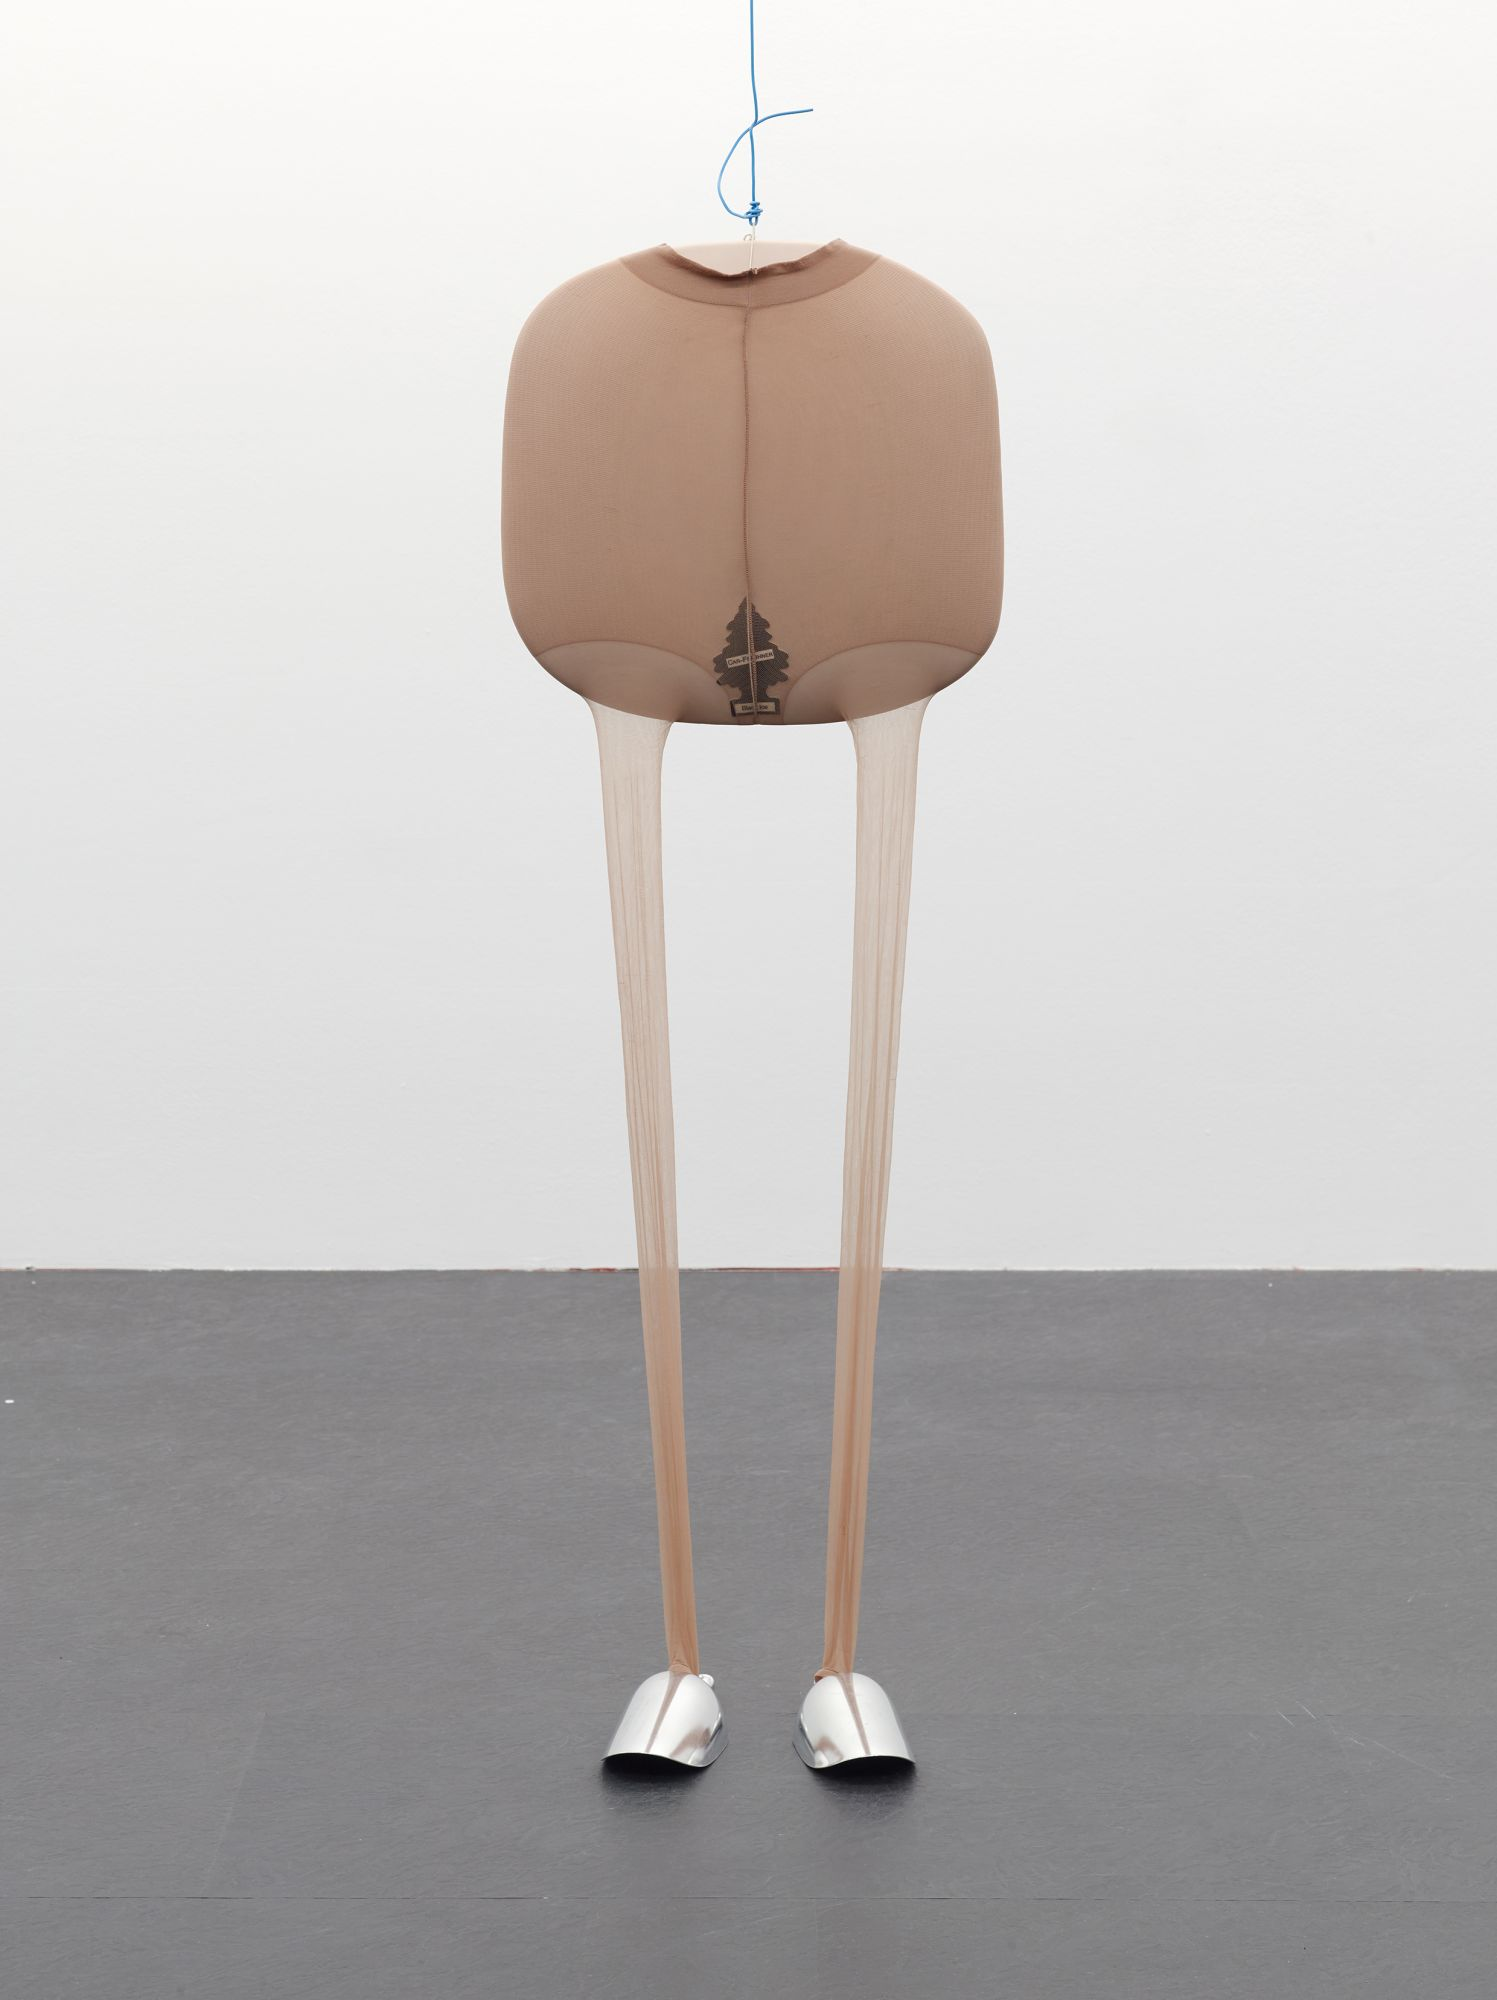 Charmant Vögel Auf Telefonkabel Kunst Galerie - Der Schaltplan ...